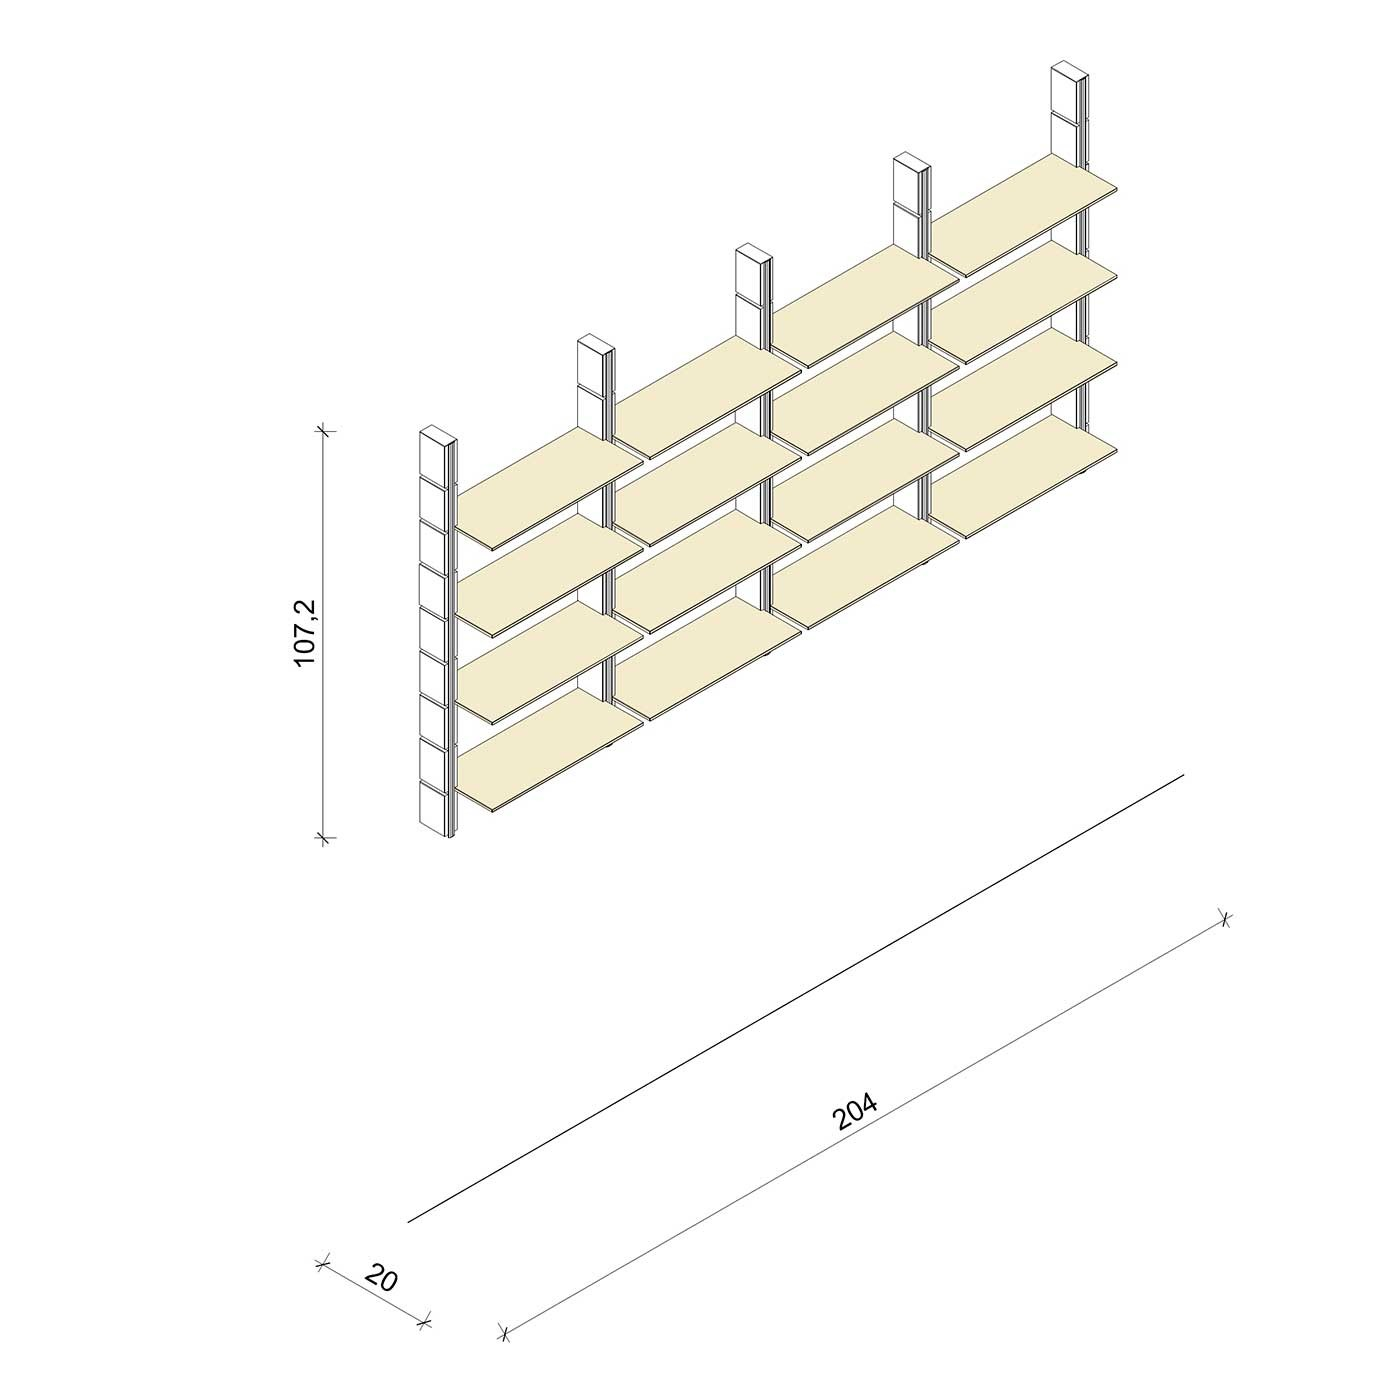 Bücherregal - Basic (M) 204 - Maß: 204 x 107,2 x 20 cm (B x H x T)